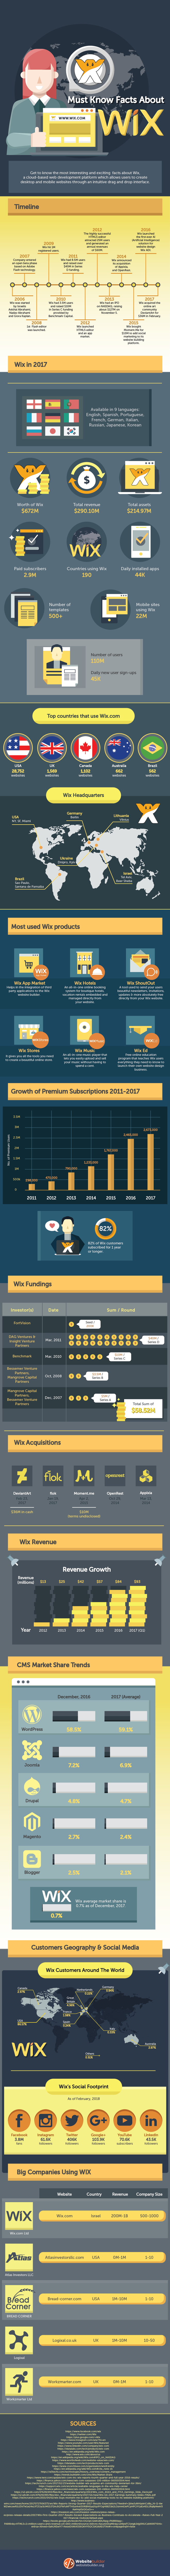 Wix Statistics Infographic